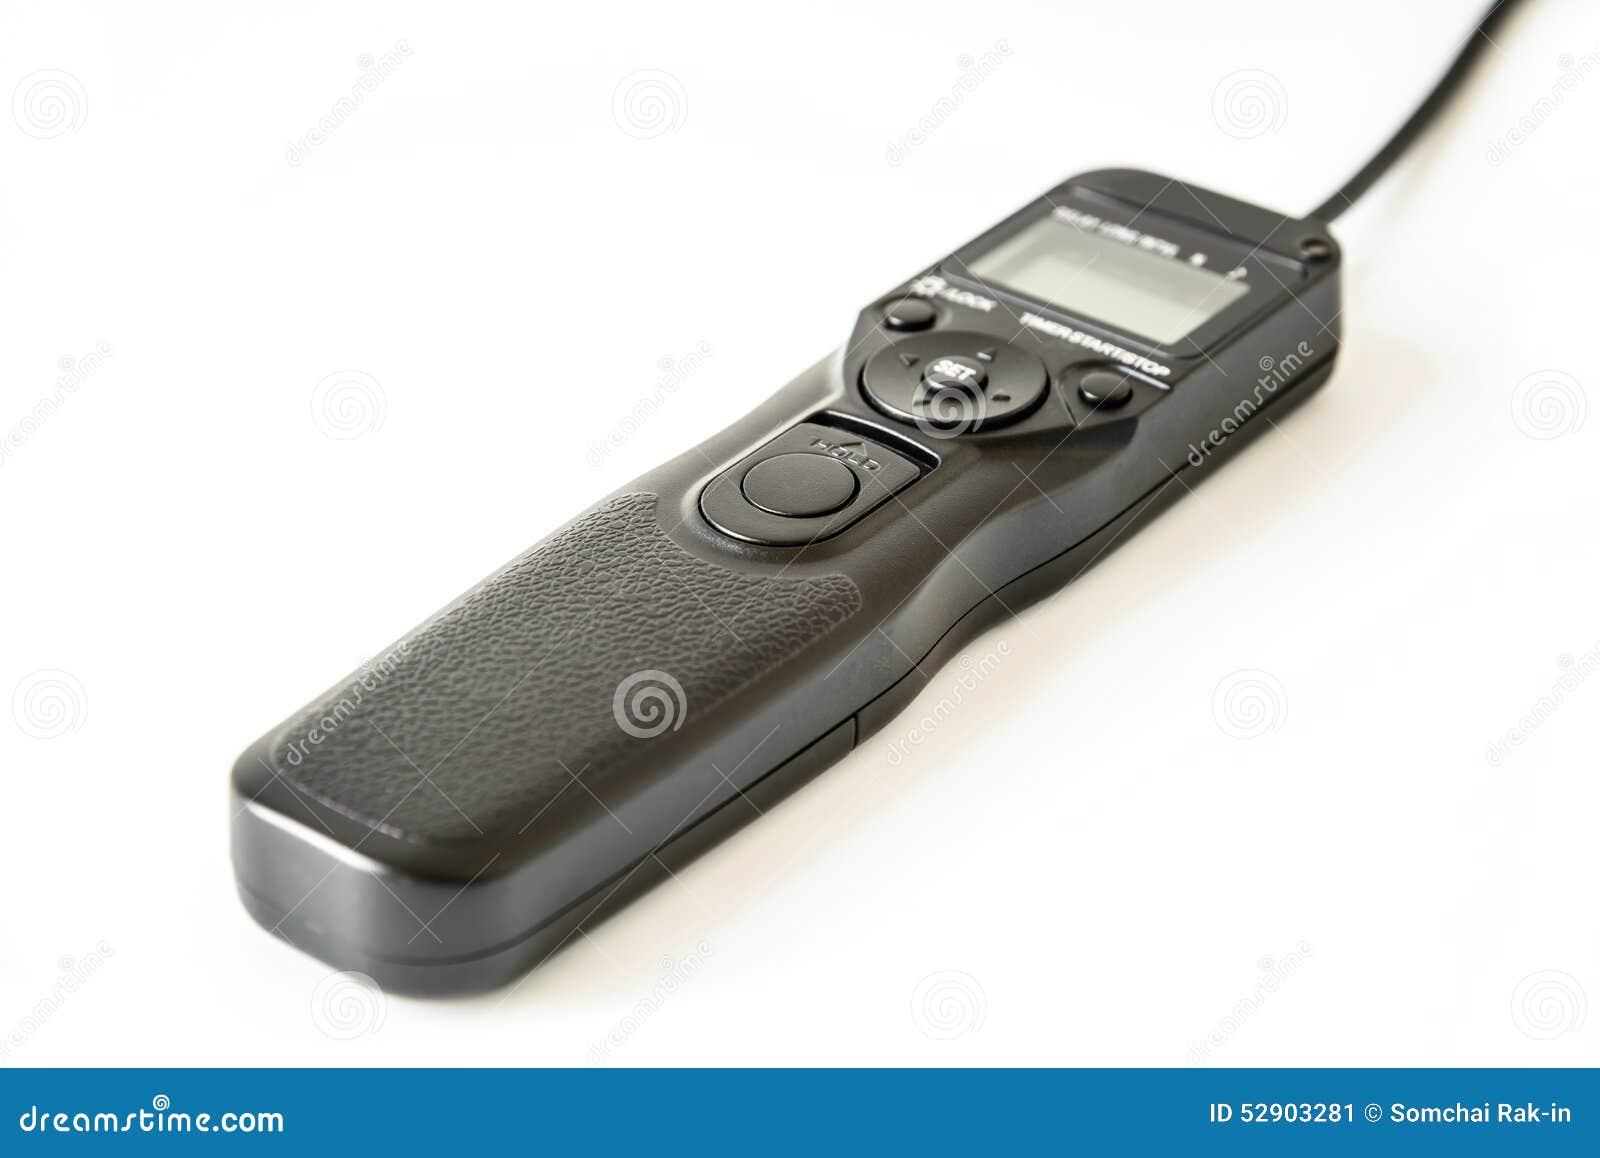 Camera Remote Control Dslr Camera remote control shutter switch of dslr camera stock photo image camera